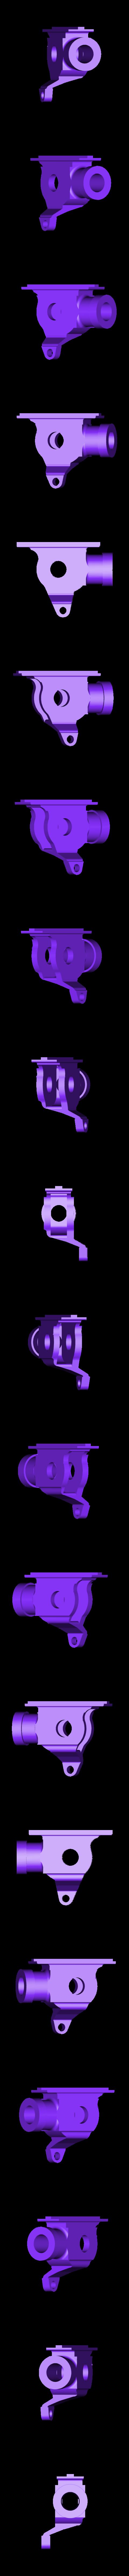 Crosshead_-_RIGHT.STL Download free STL file 4-8-8-4 Big Boy Locomotive • 3D printer object, RaymondDeLuca